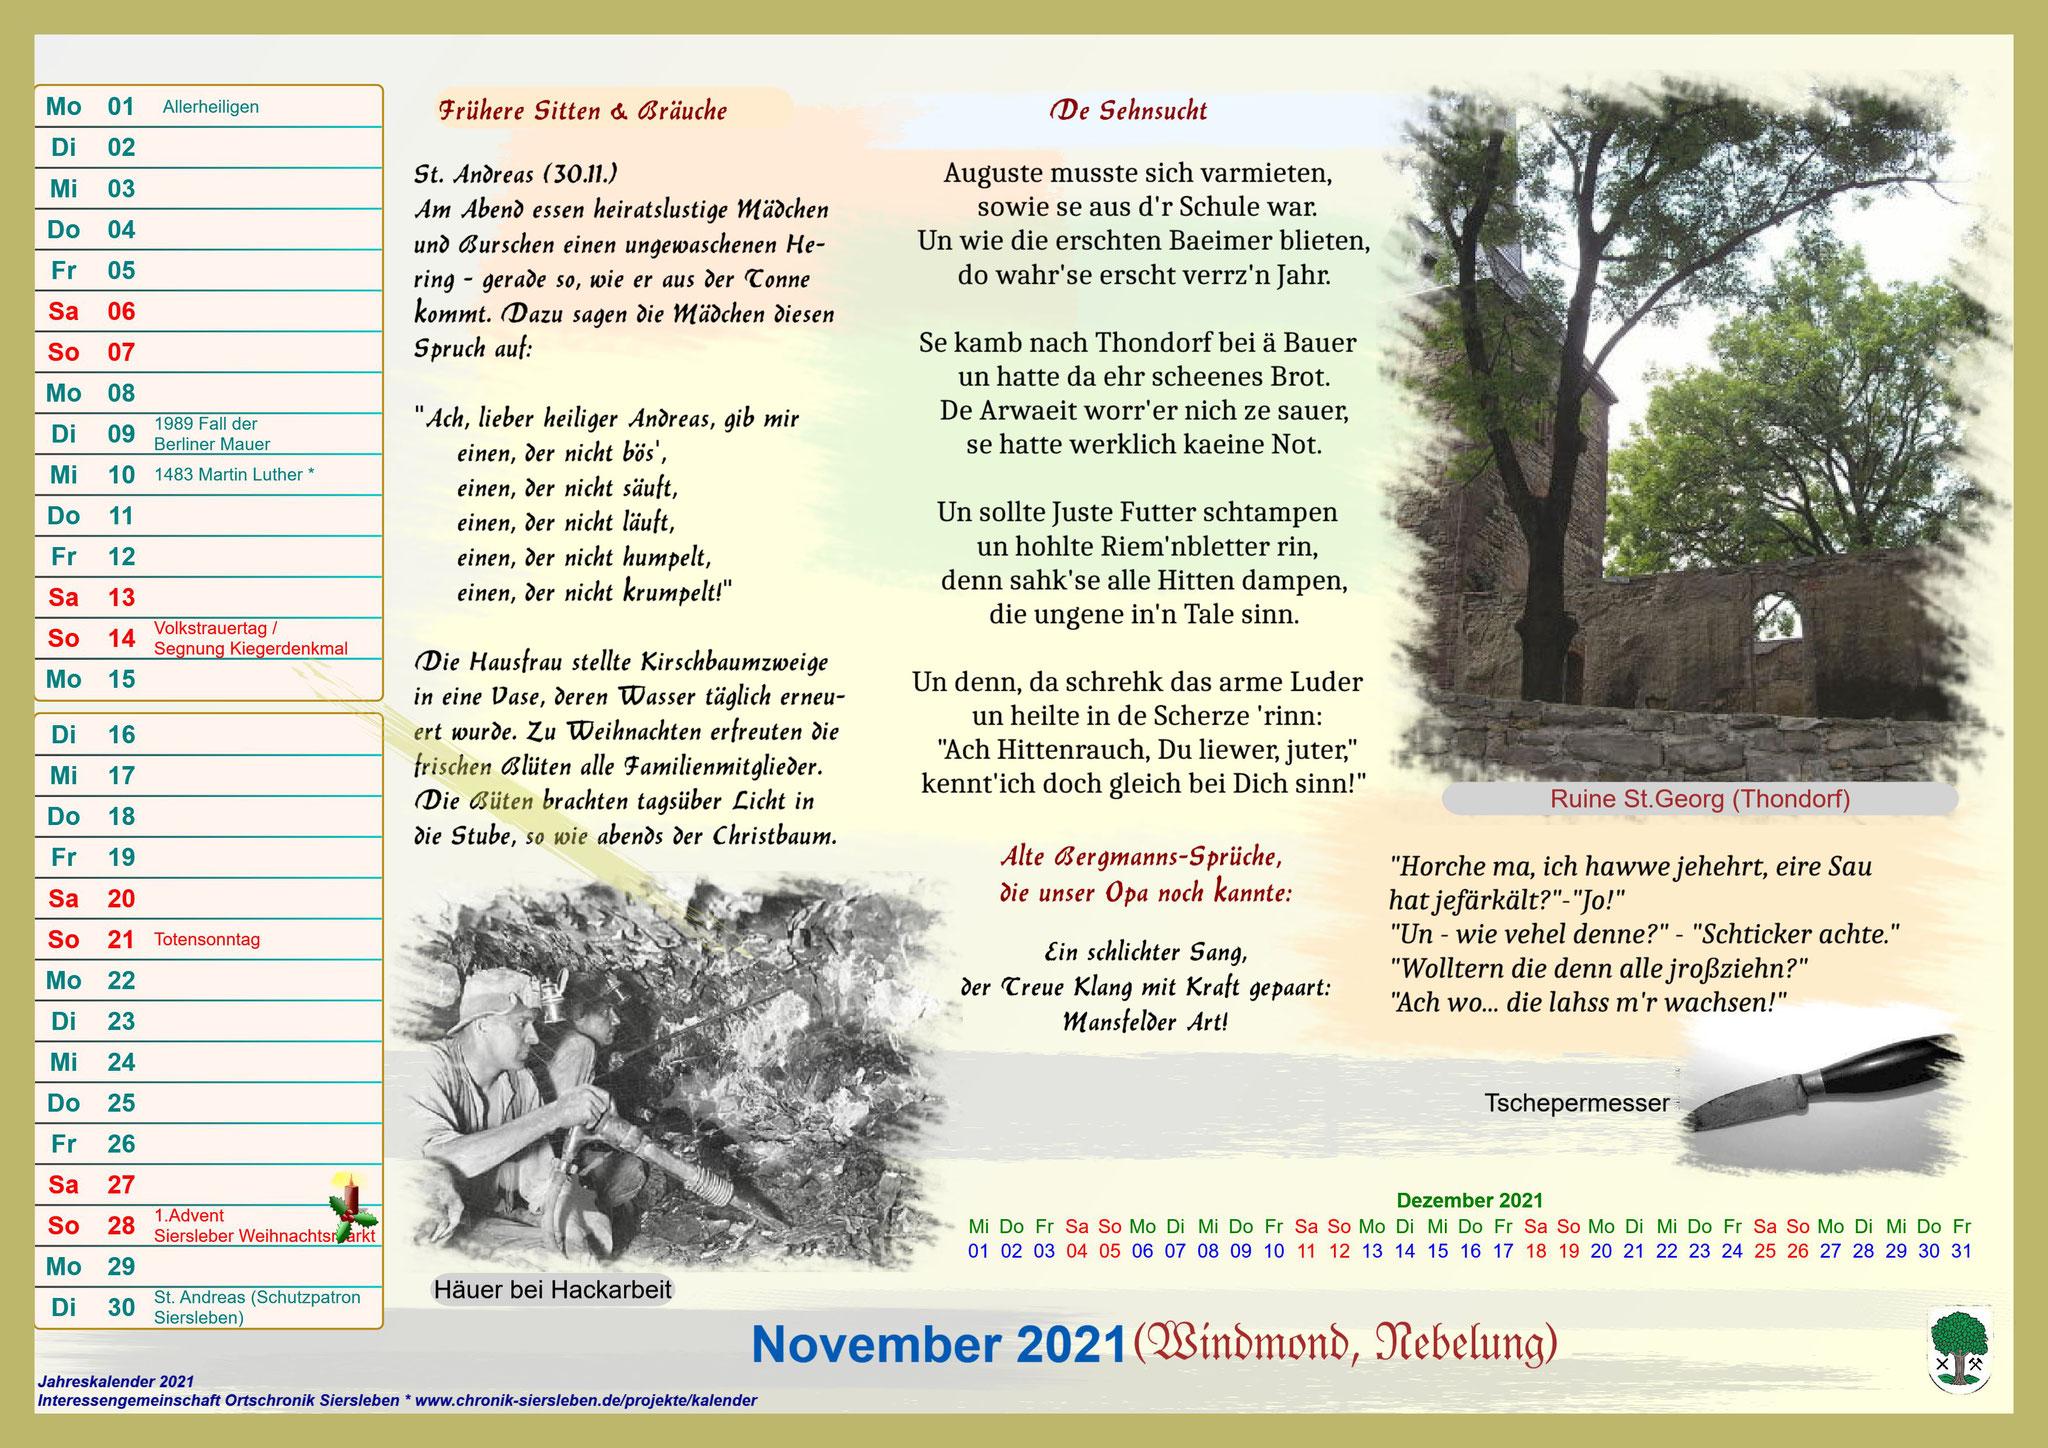 Jahreskalender 2021; November